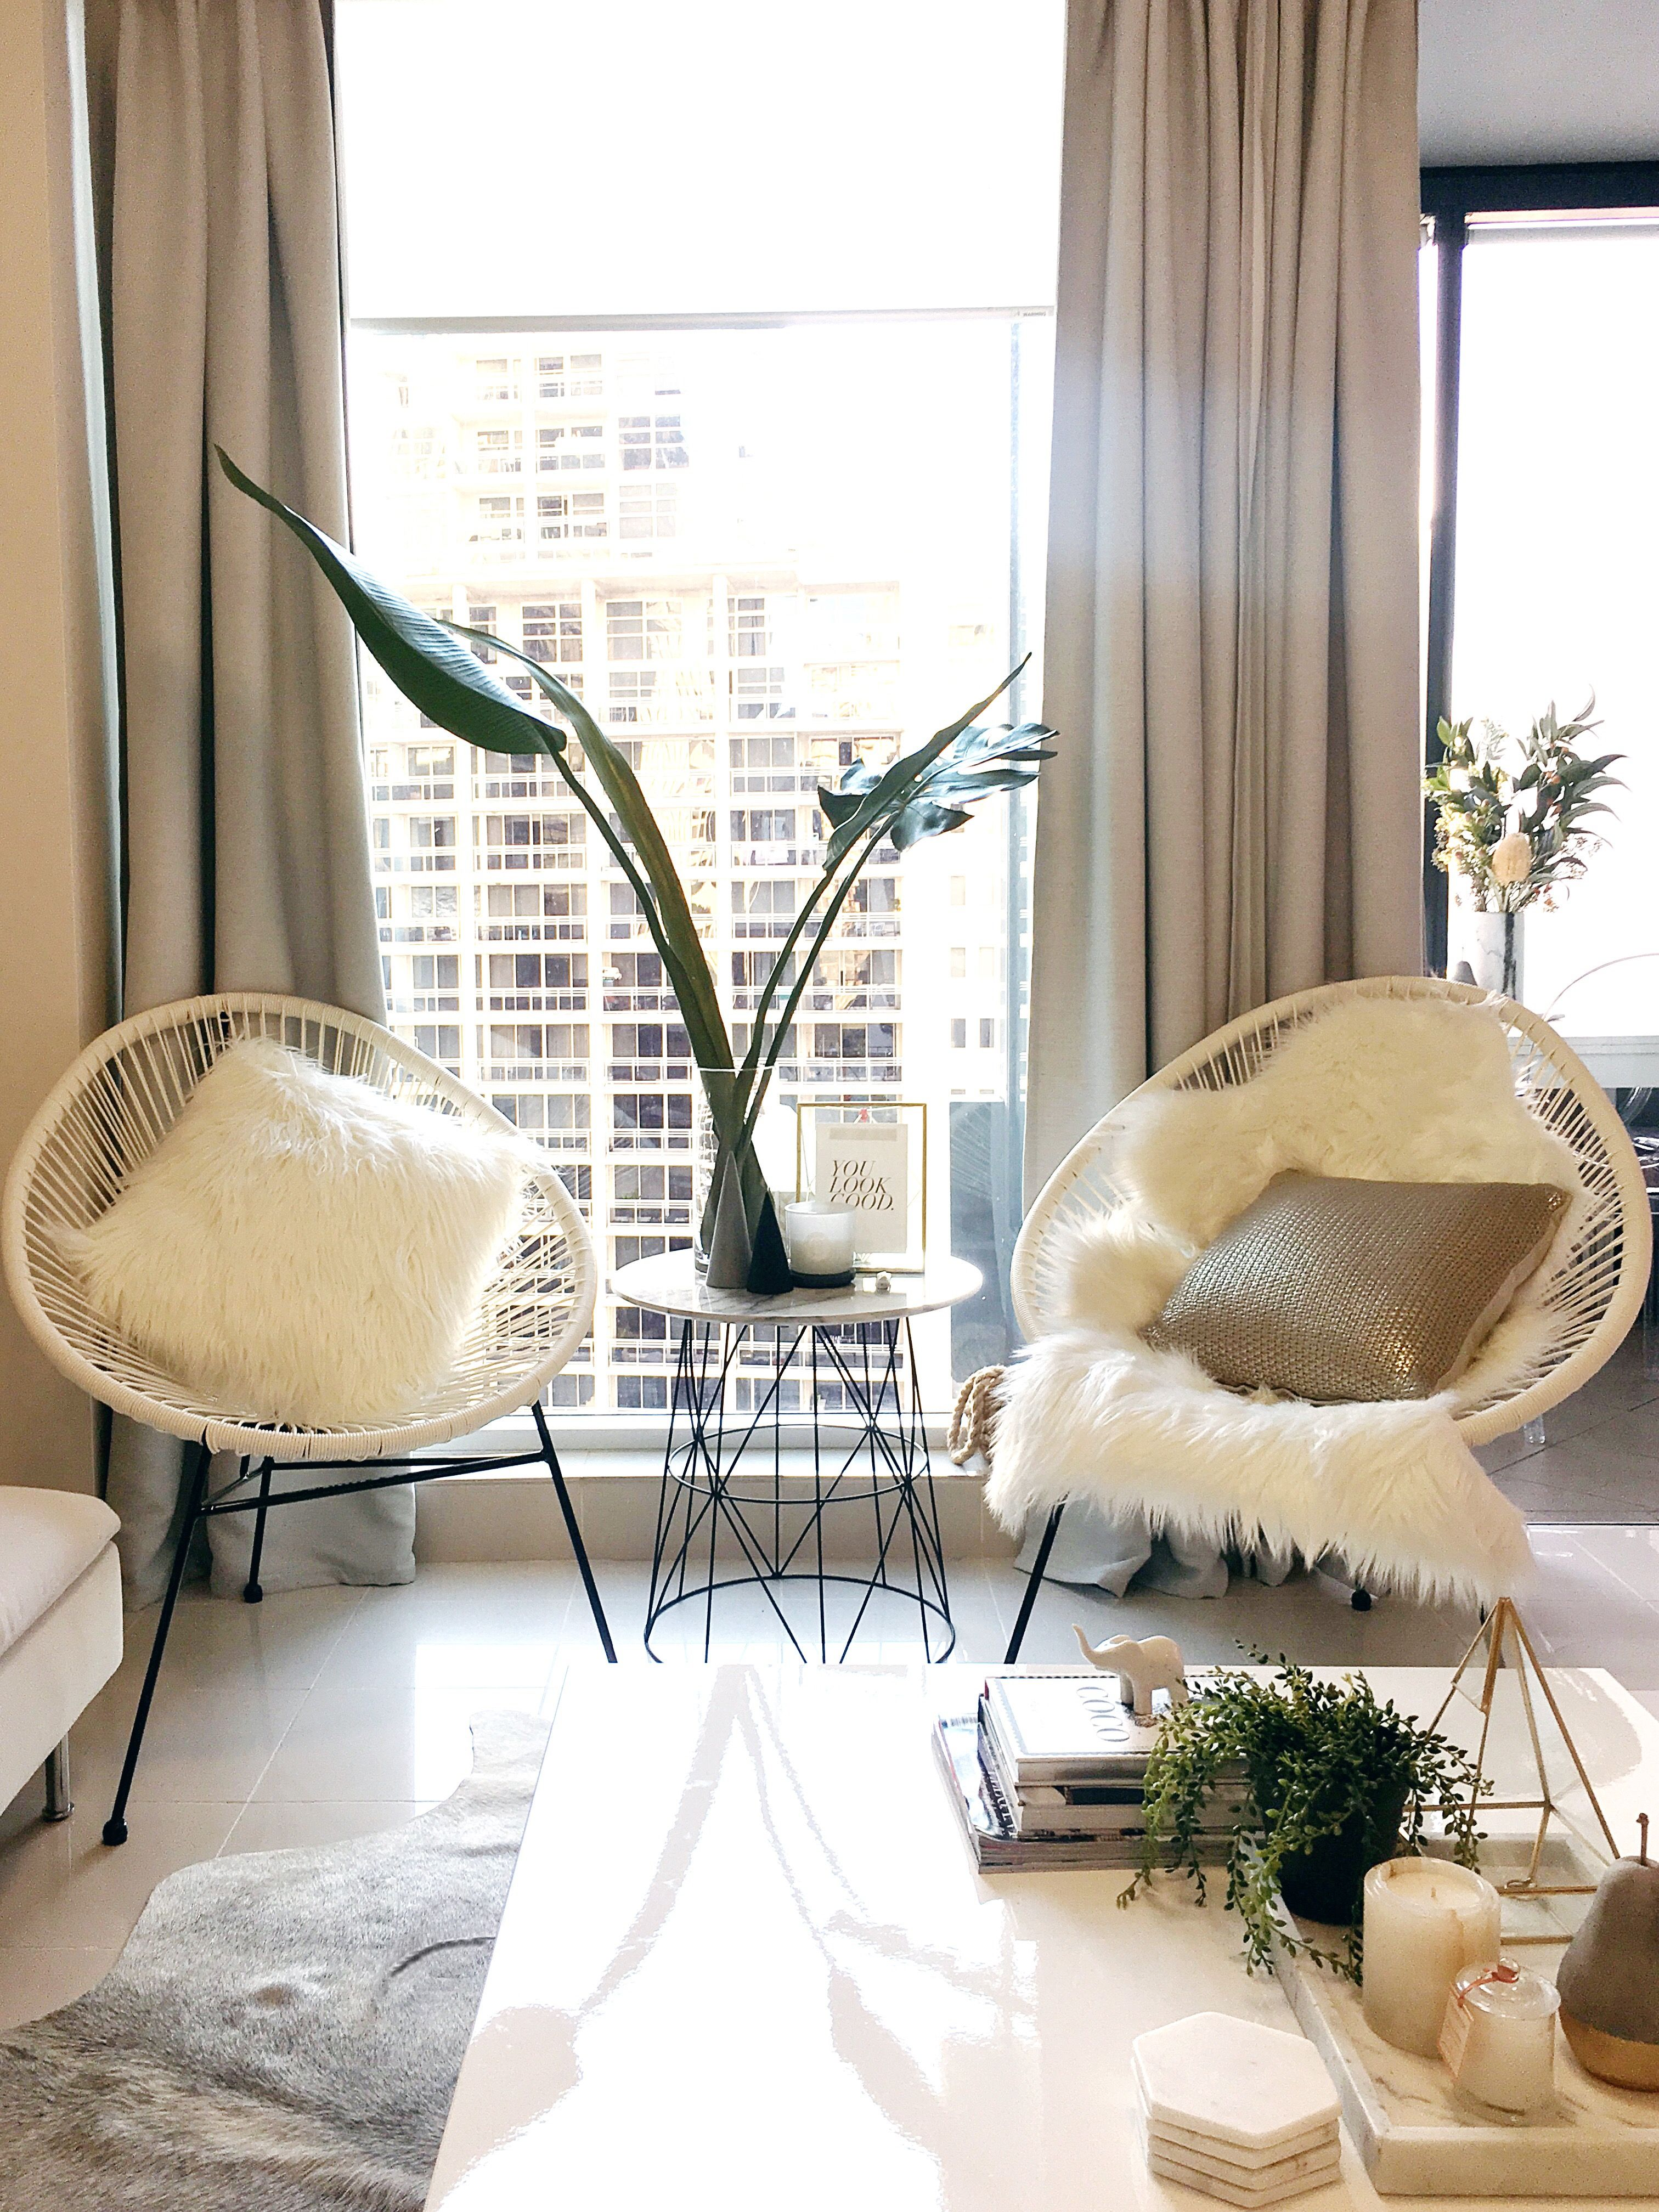 Created Apartment Chairs Space Shopping City LivingAcapulco This JF1TlKc3u